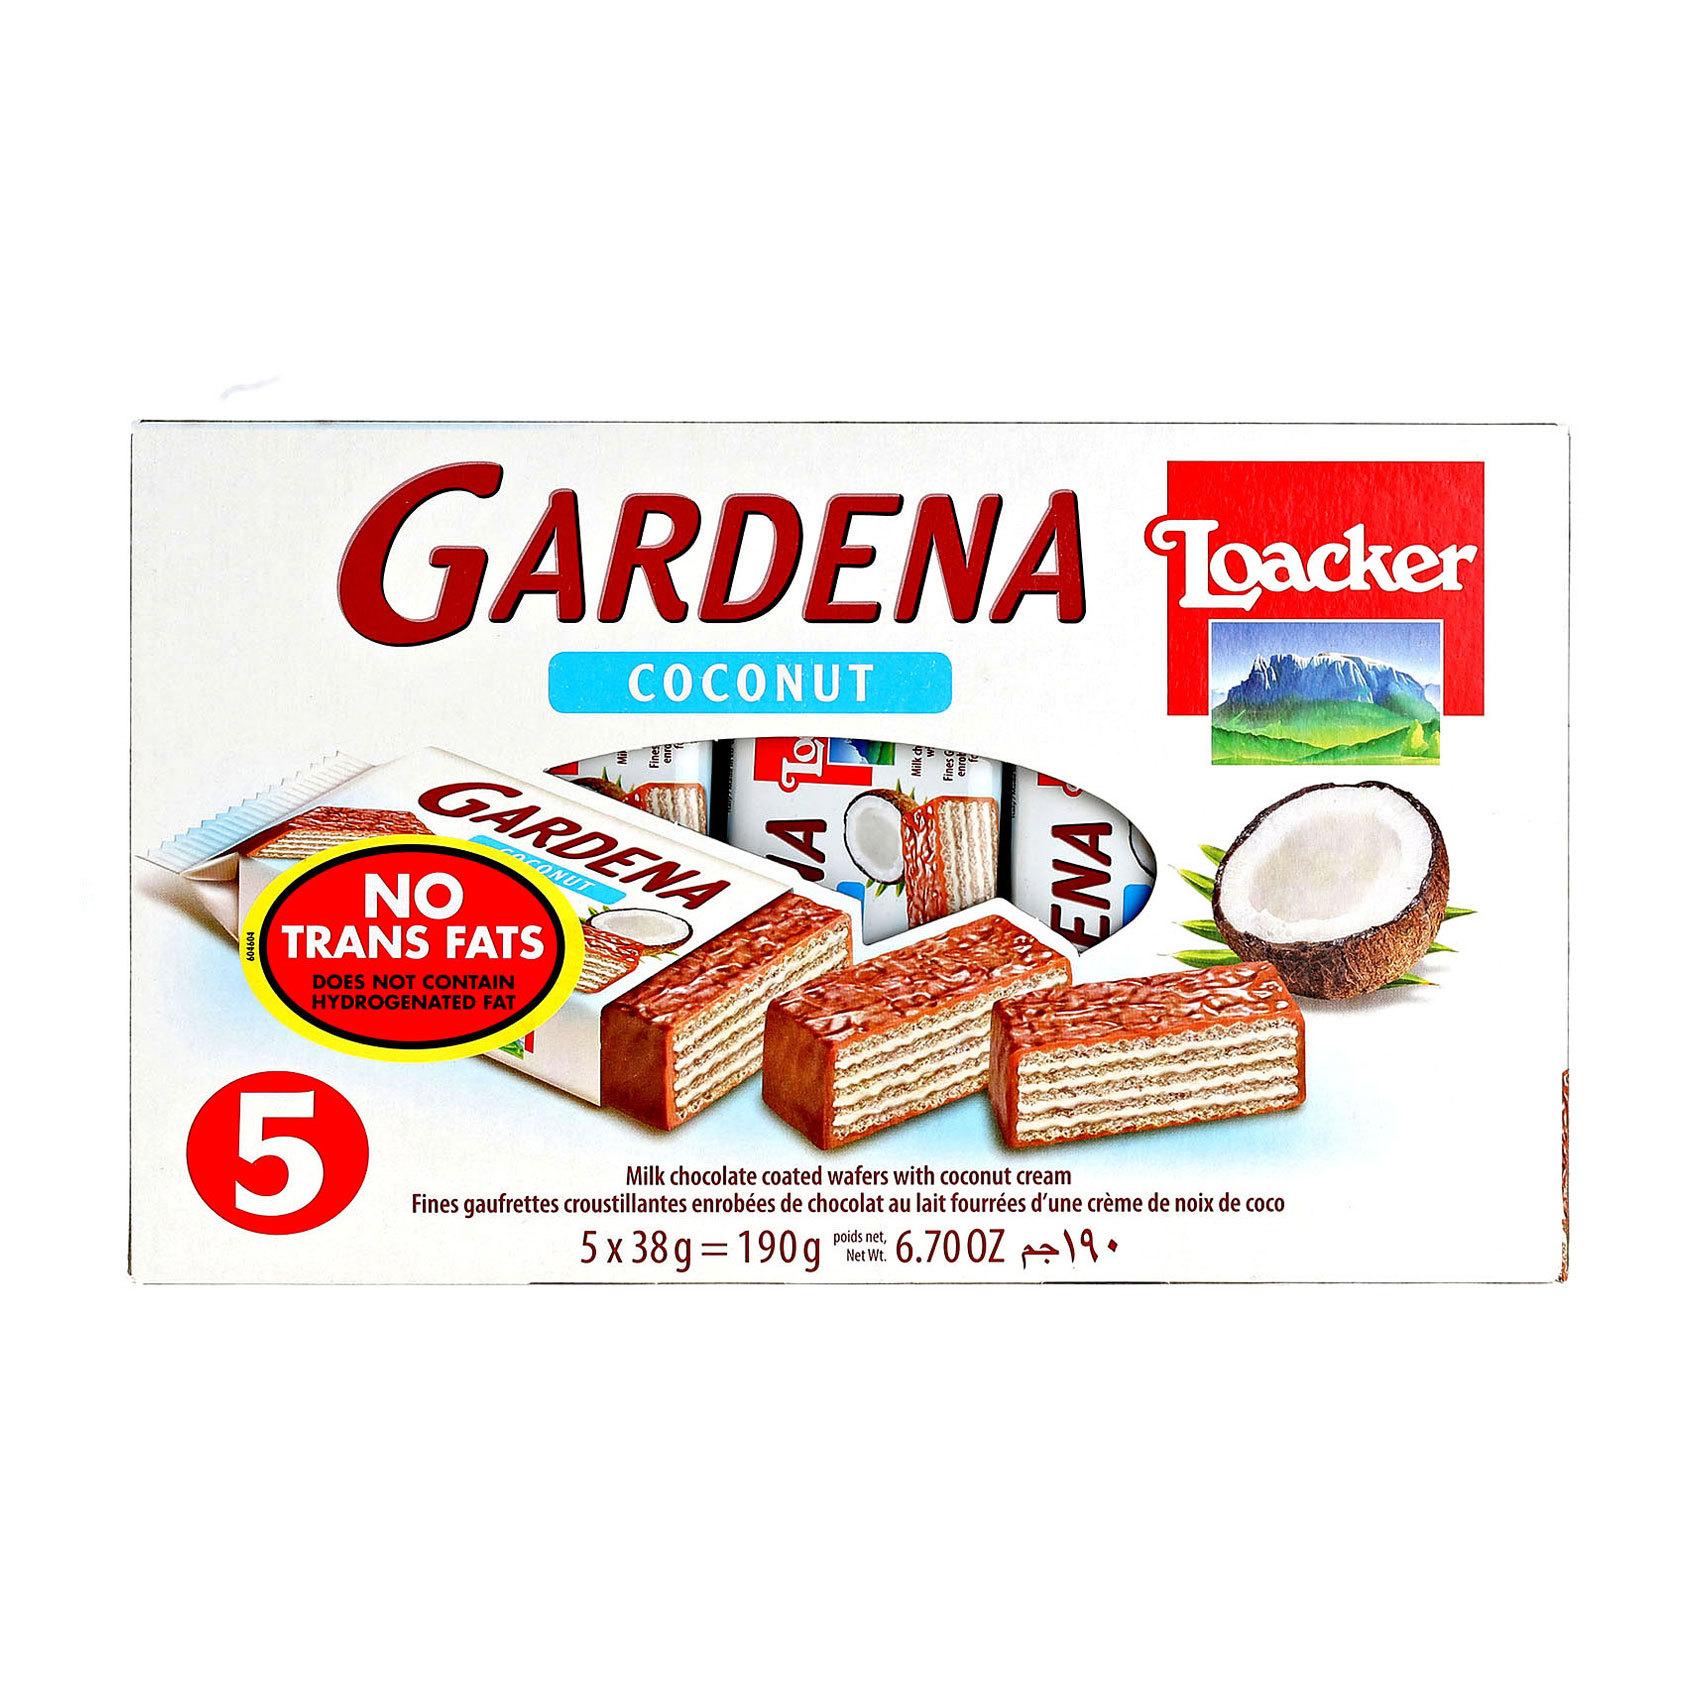 LOACKER GARDENA COCONUT 5X38G